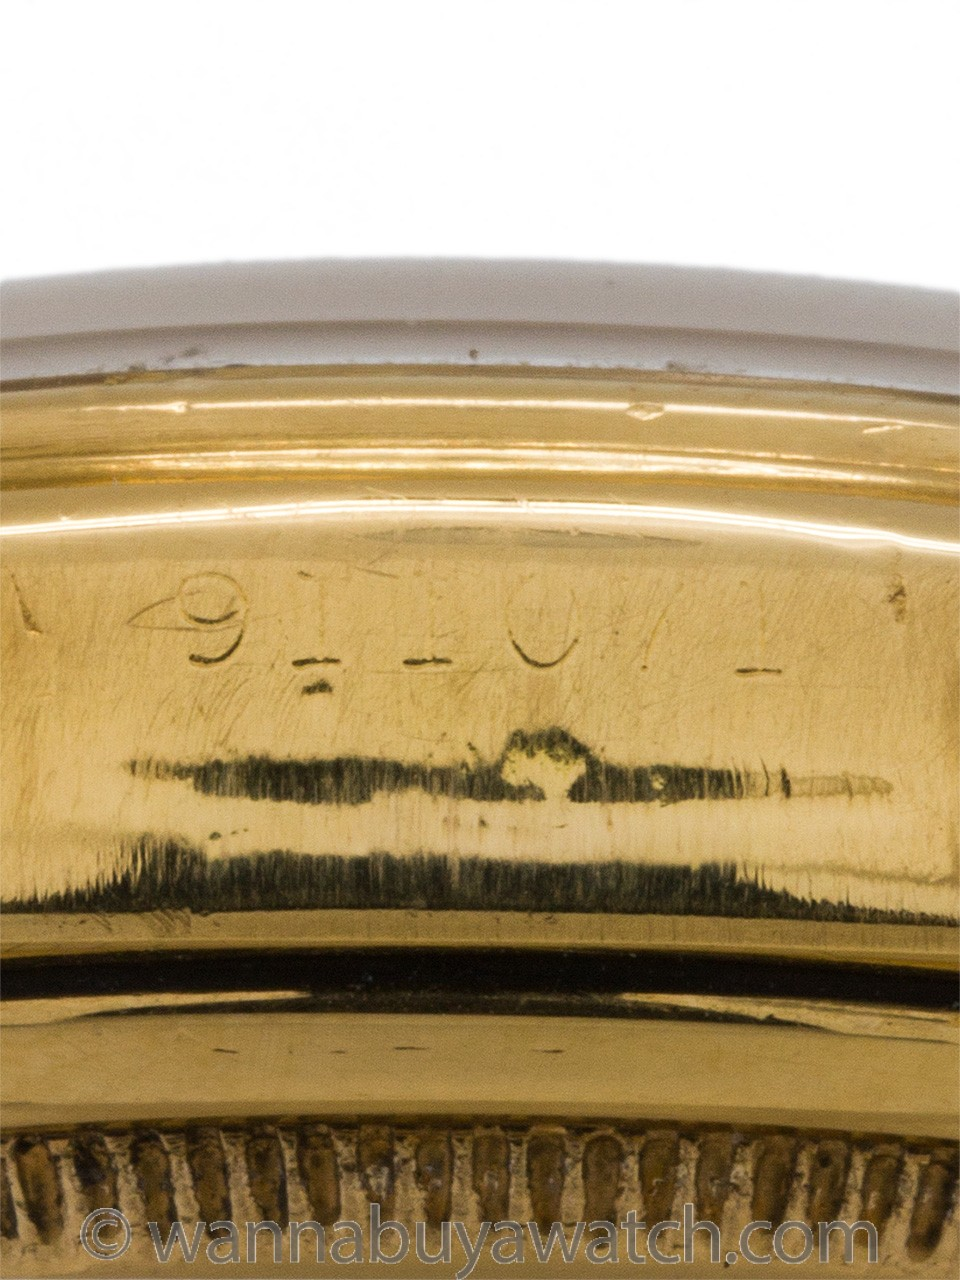 "Rolex ref 6062 Oyster Moonphase Star Dial ""Stelline"" 18K YG circa 1952"